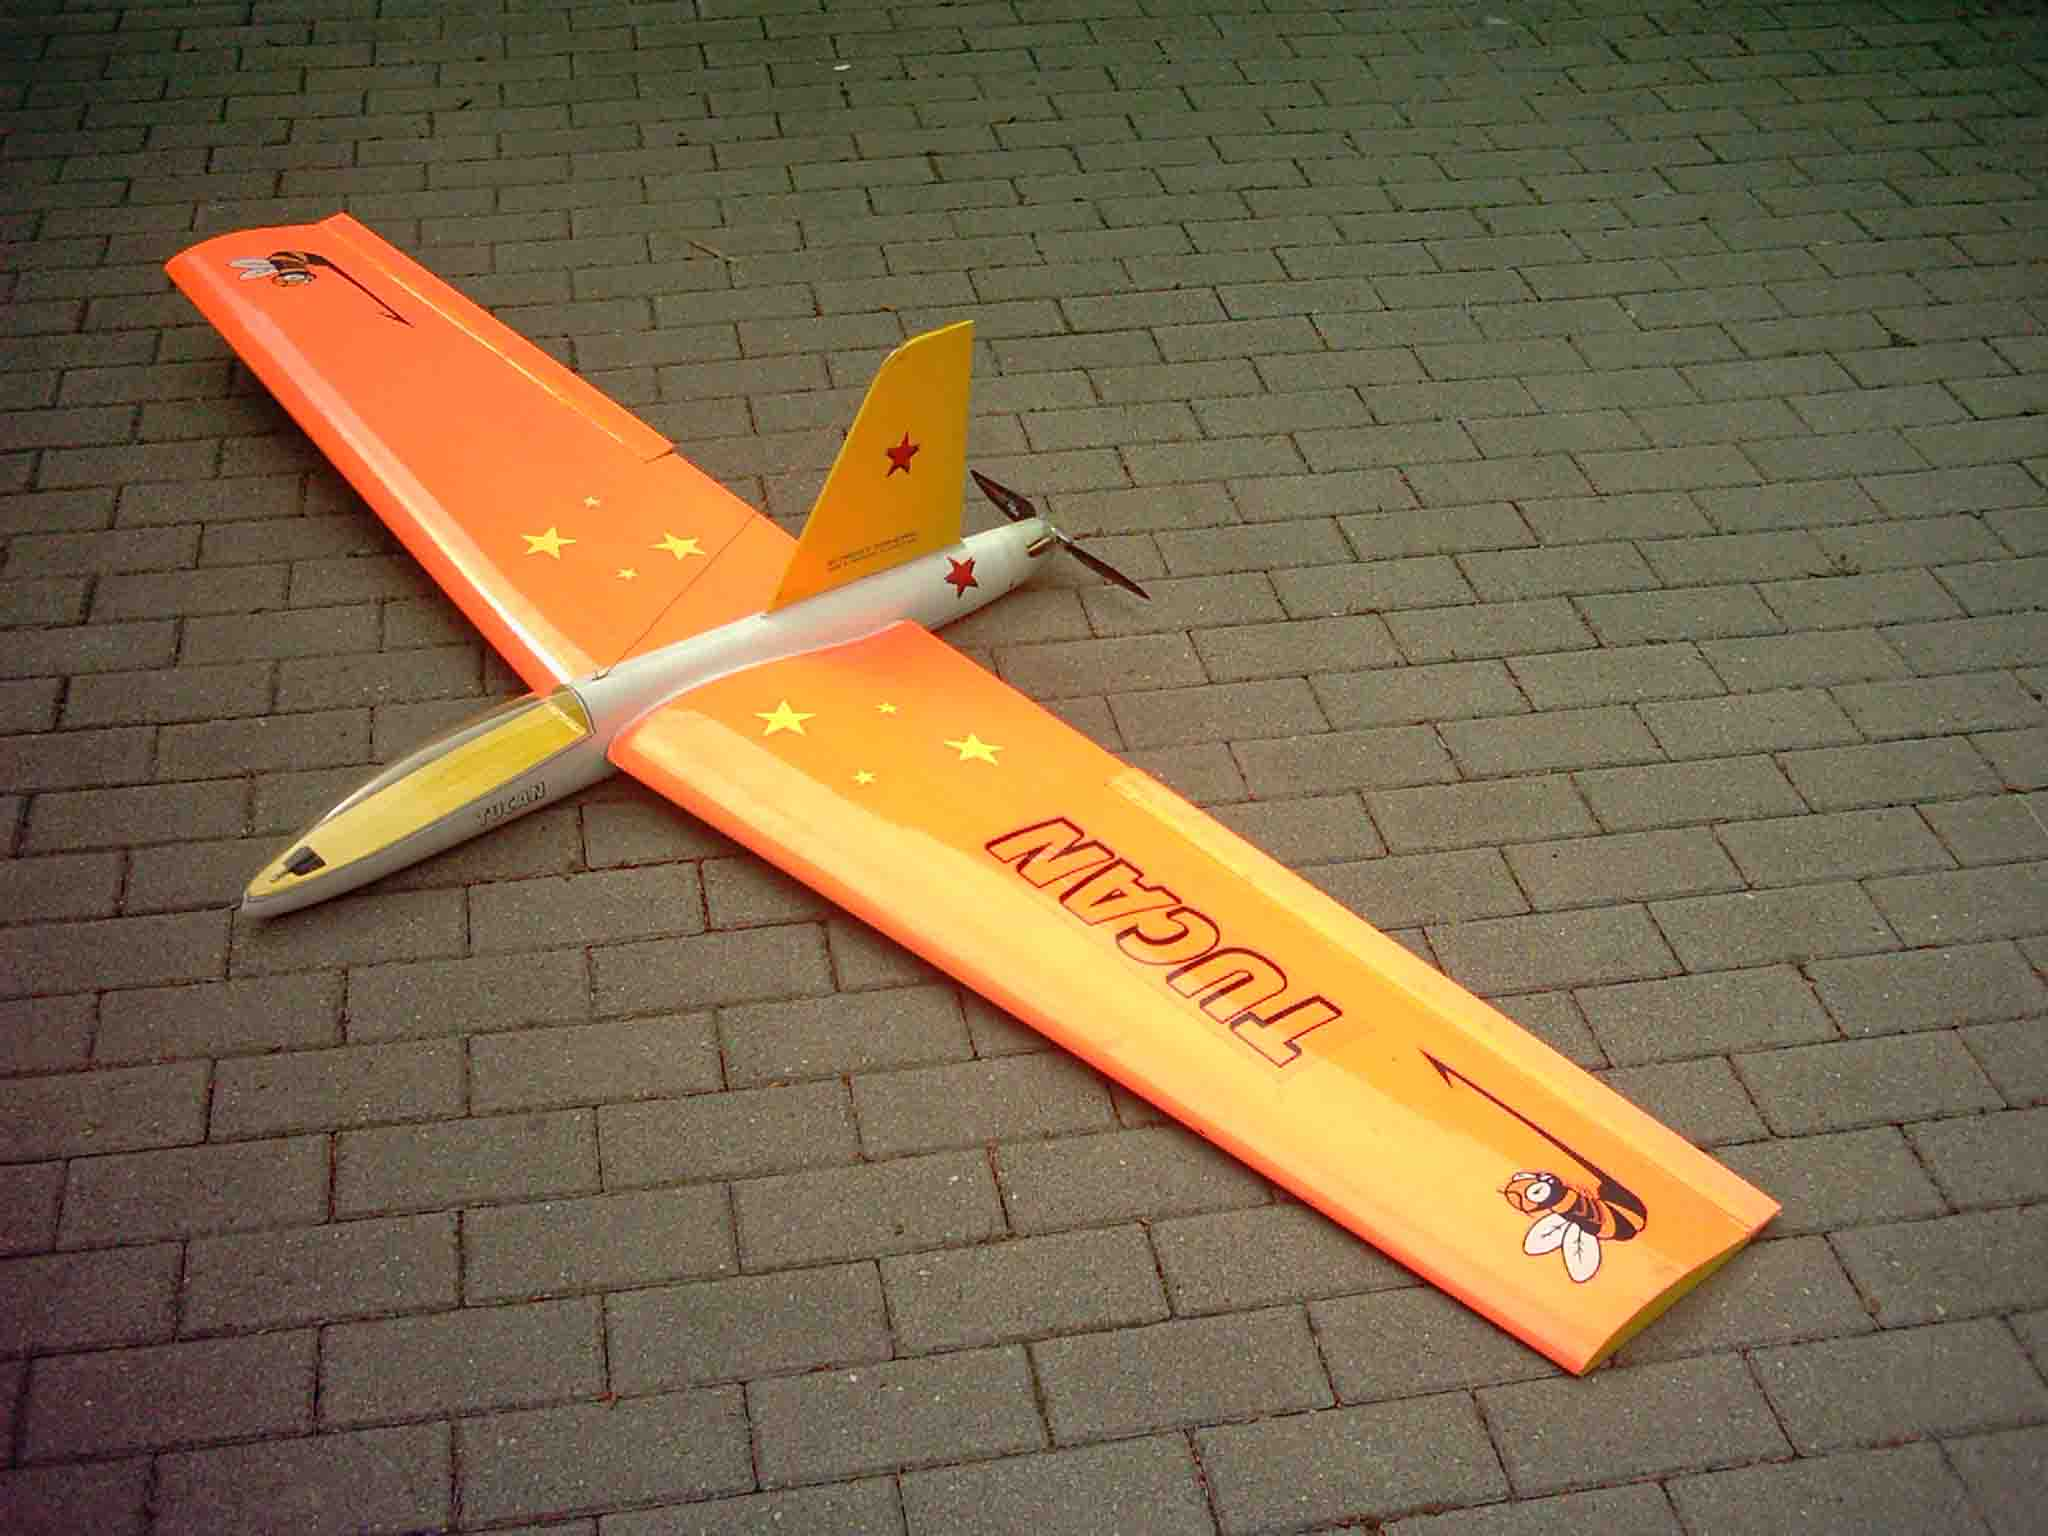 Tucan Nurflügler 208 Cm Rc Tronics Topp Rippin Ek